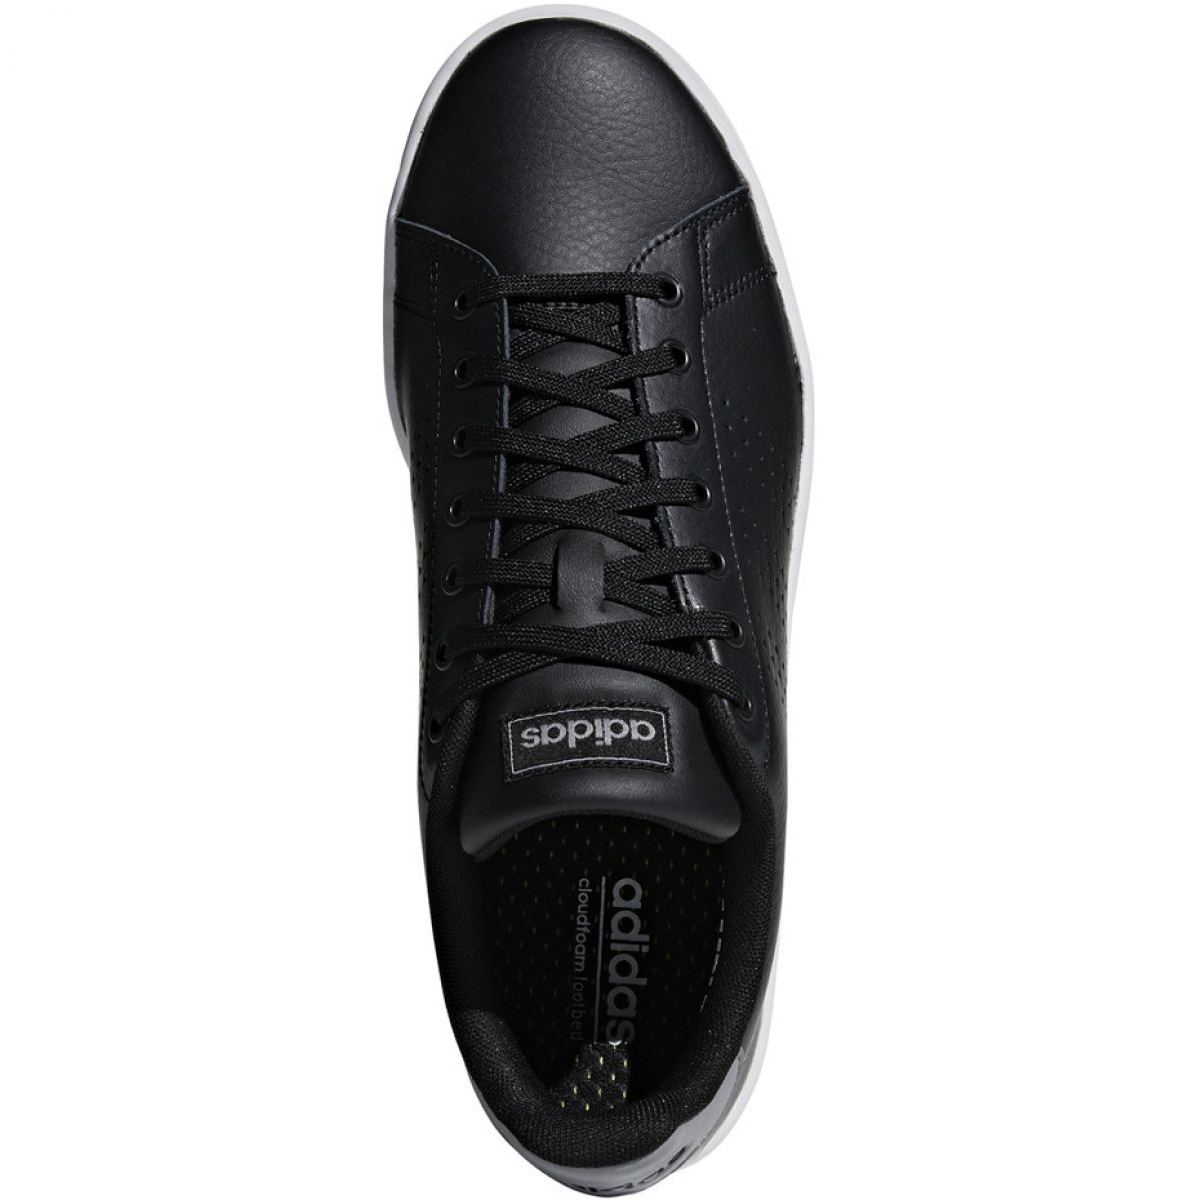 Adidas Advantage M F36423 cipő fehér